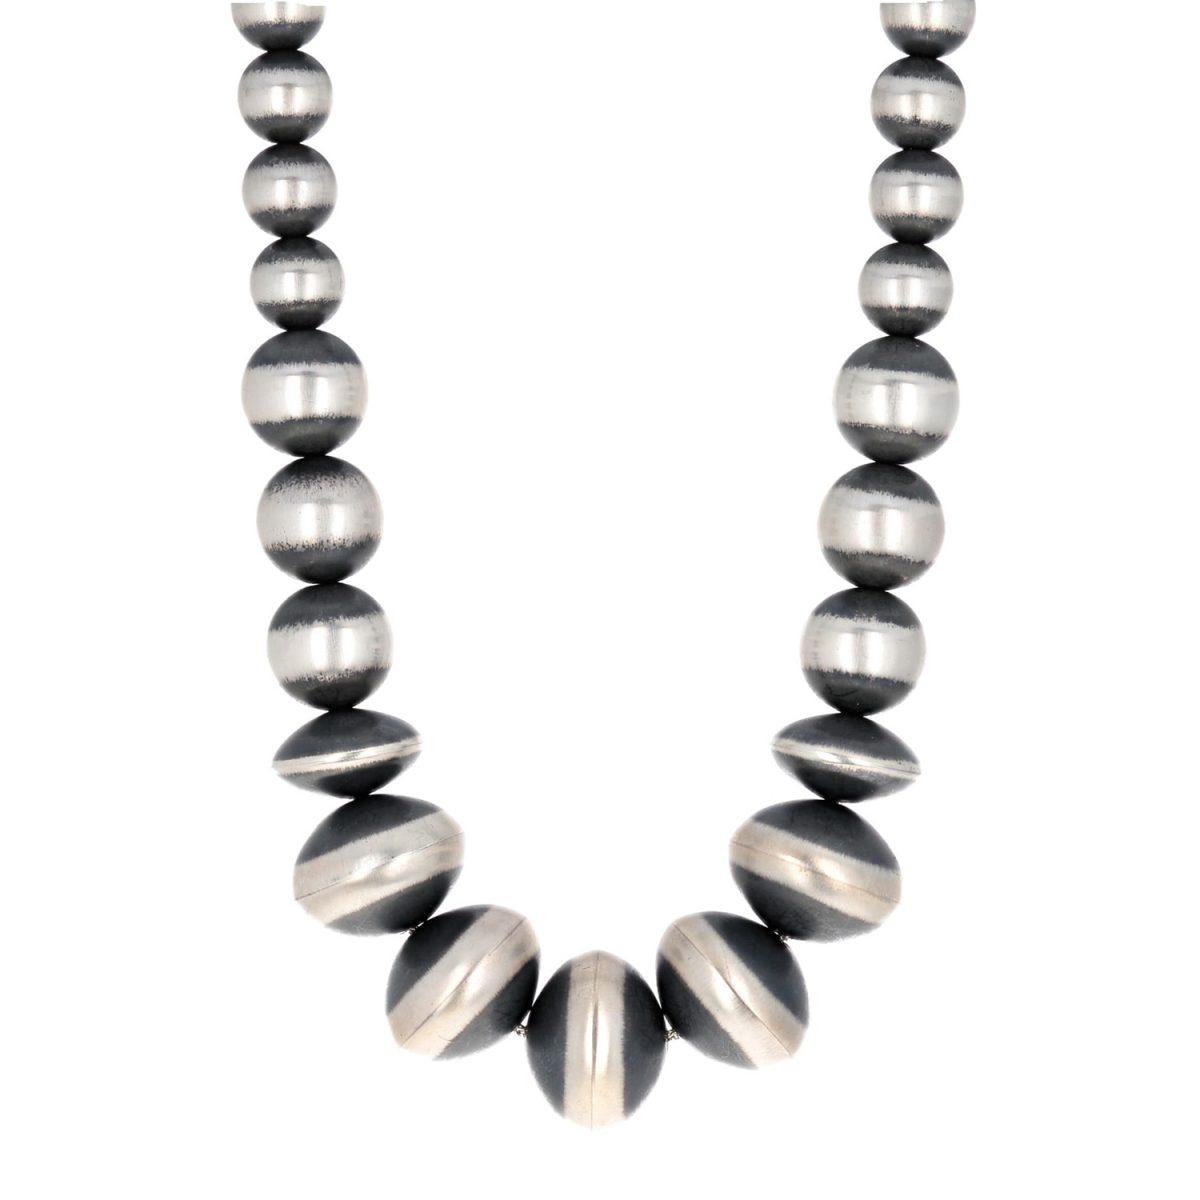 Navajo-Pearls-Large-Beads-2